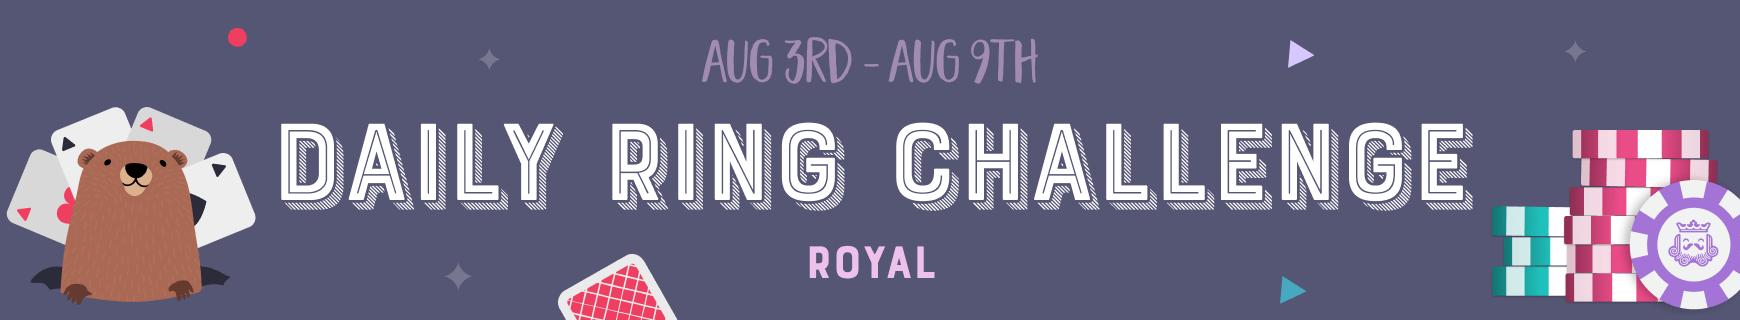 Daily ring challenge   royal   dashboard %28870 x 160%29 2x